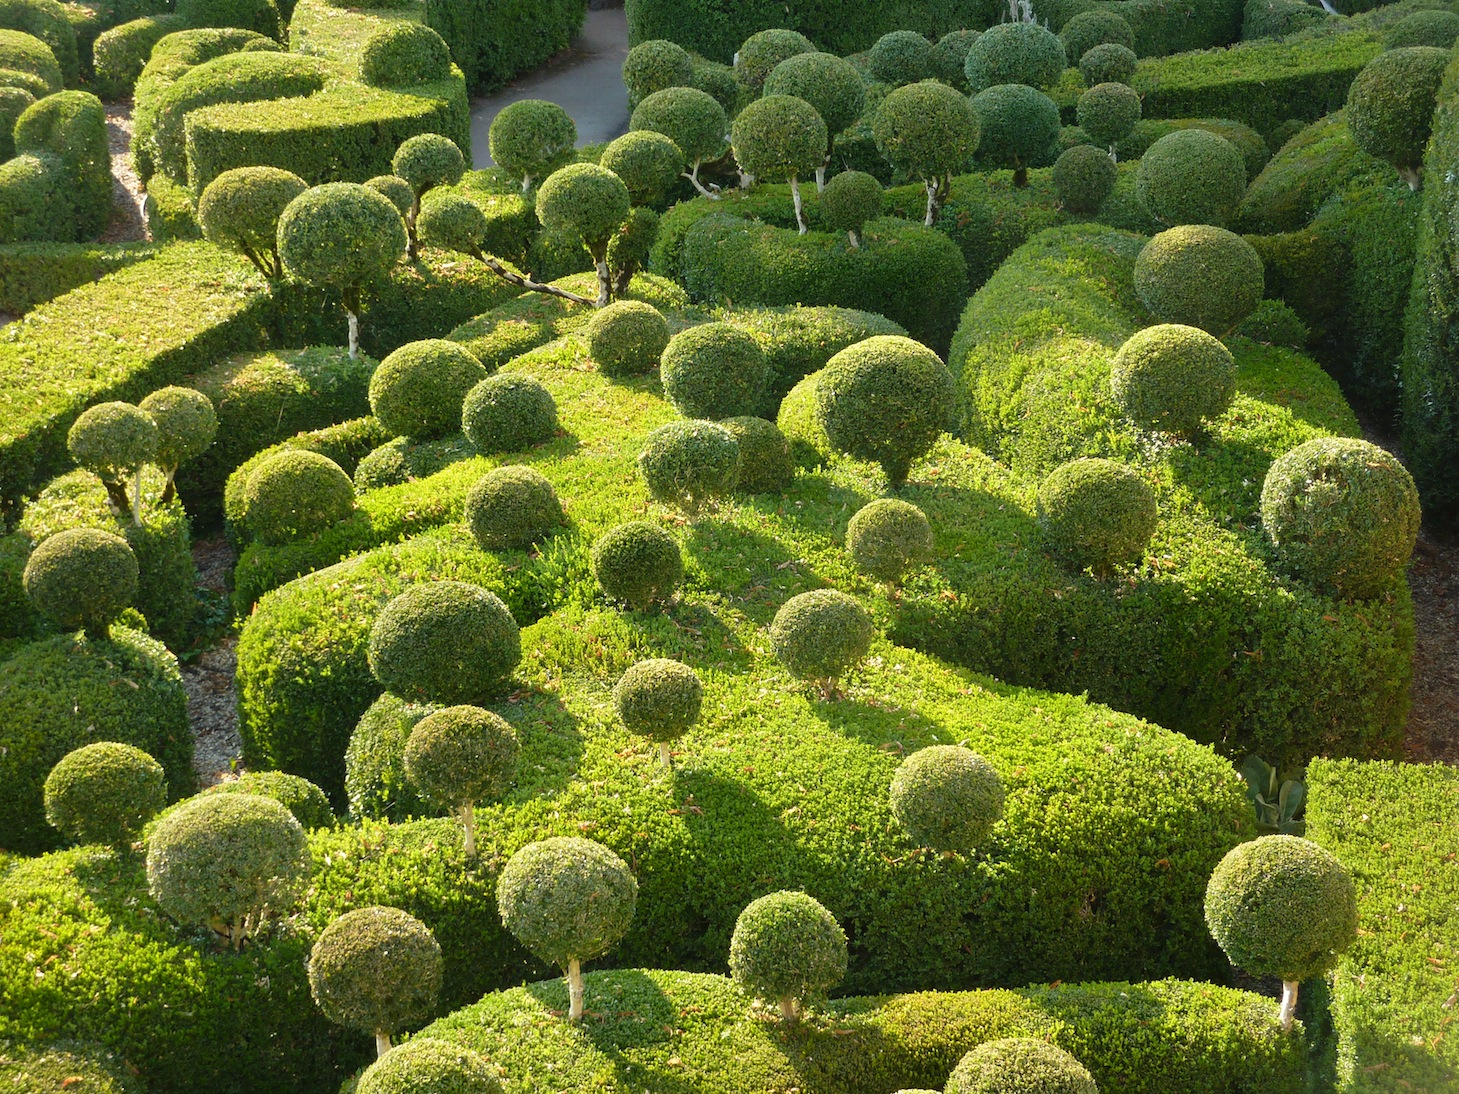 meabh warburton les jardins suspendus de marqueyssac. Black Bedroom Furniture Sets. Home Design Ideas